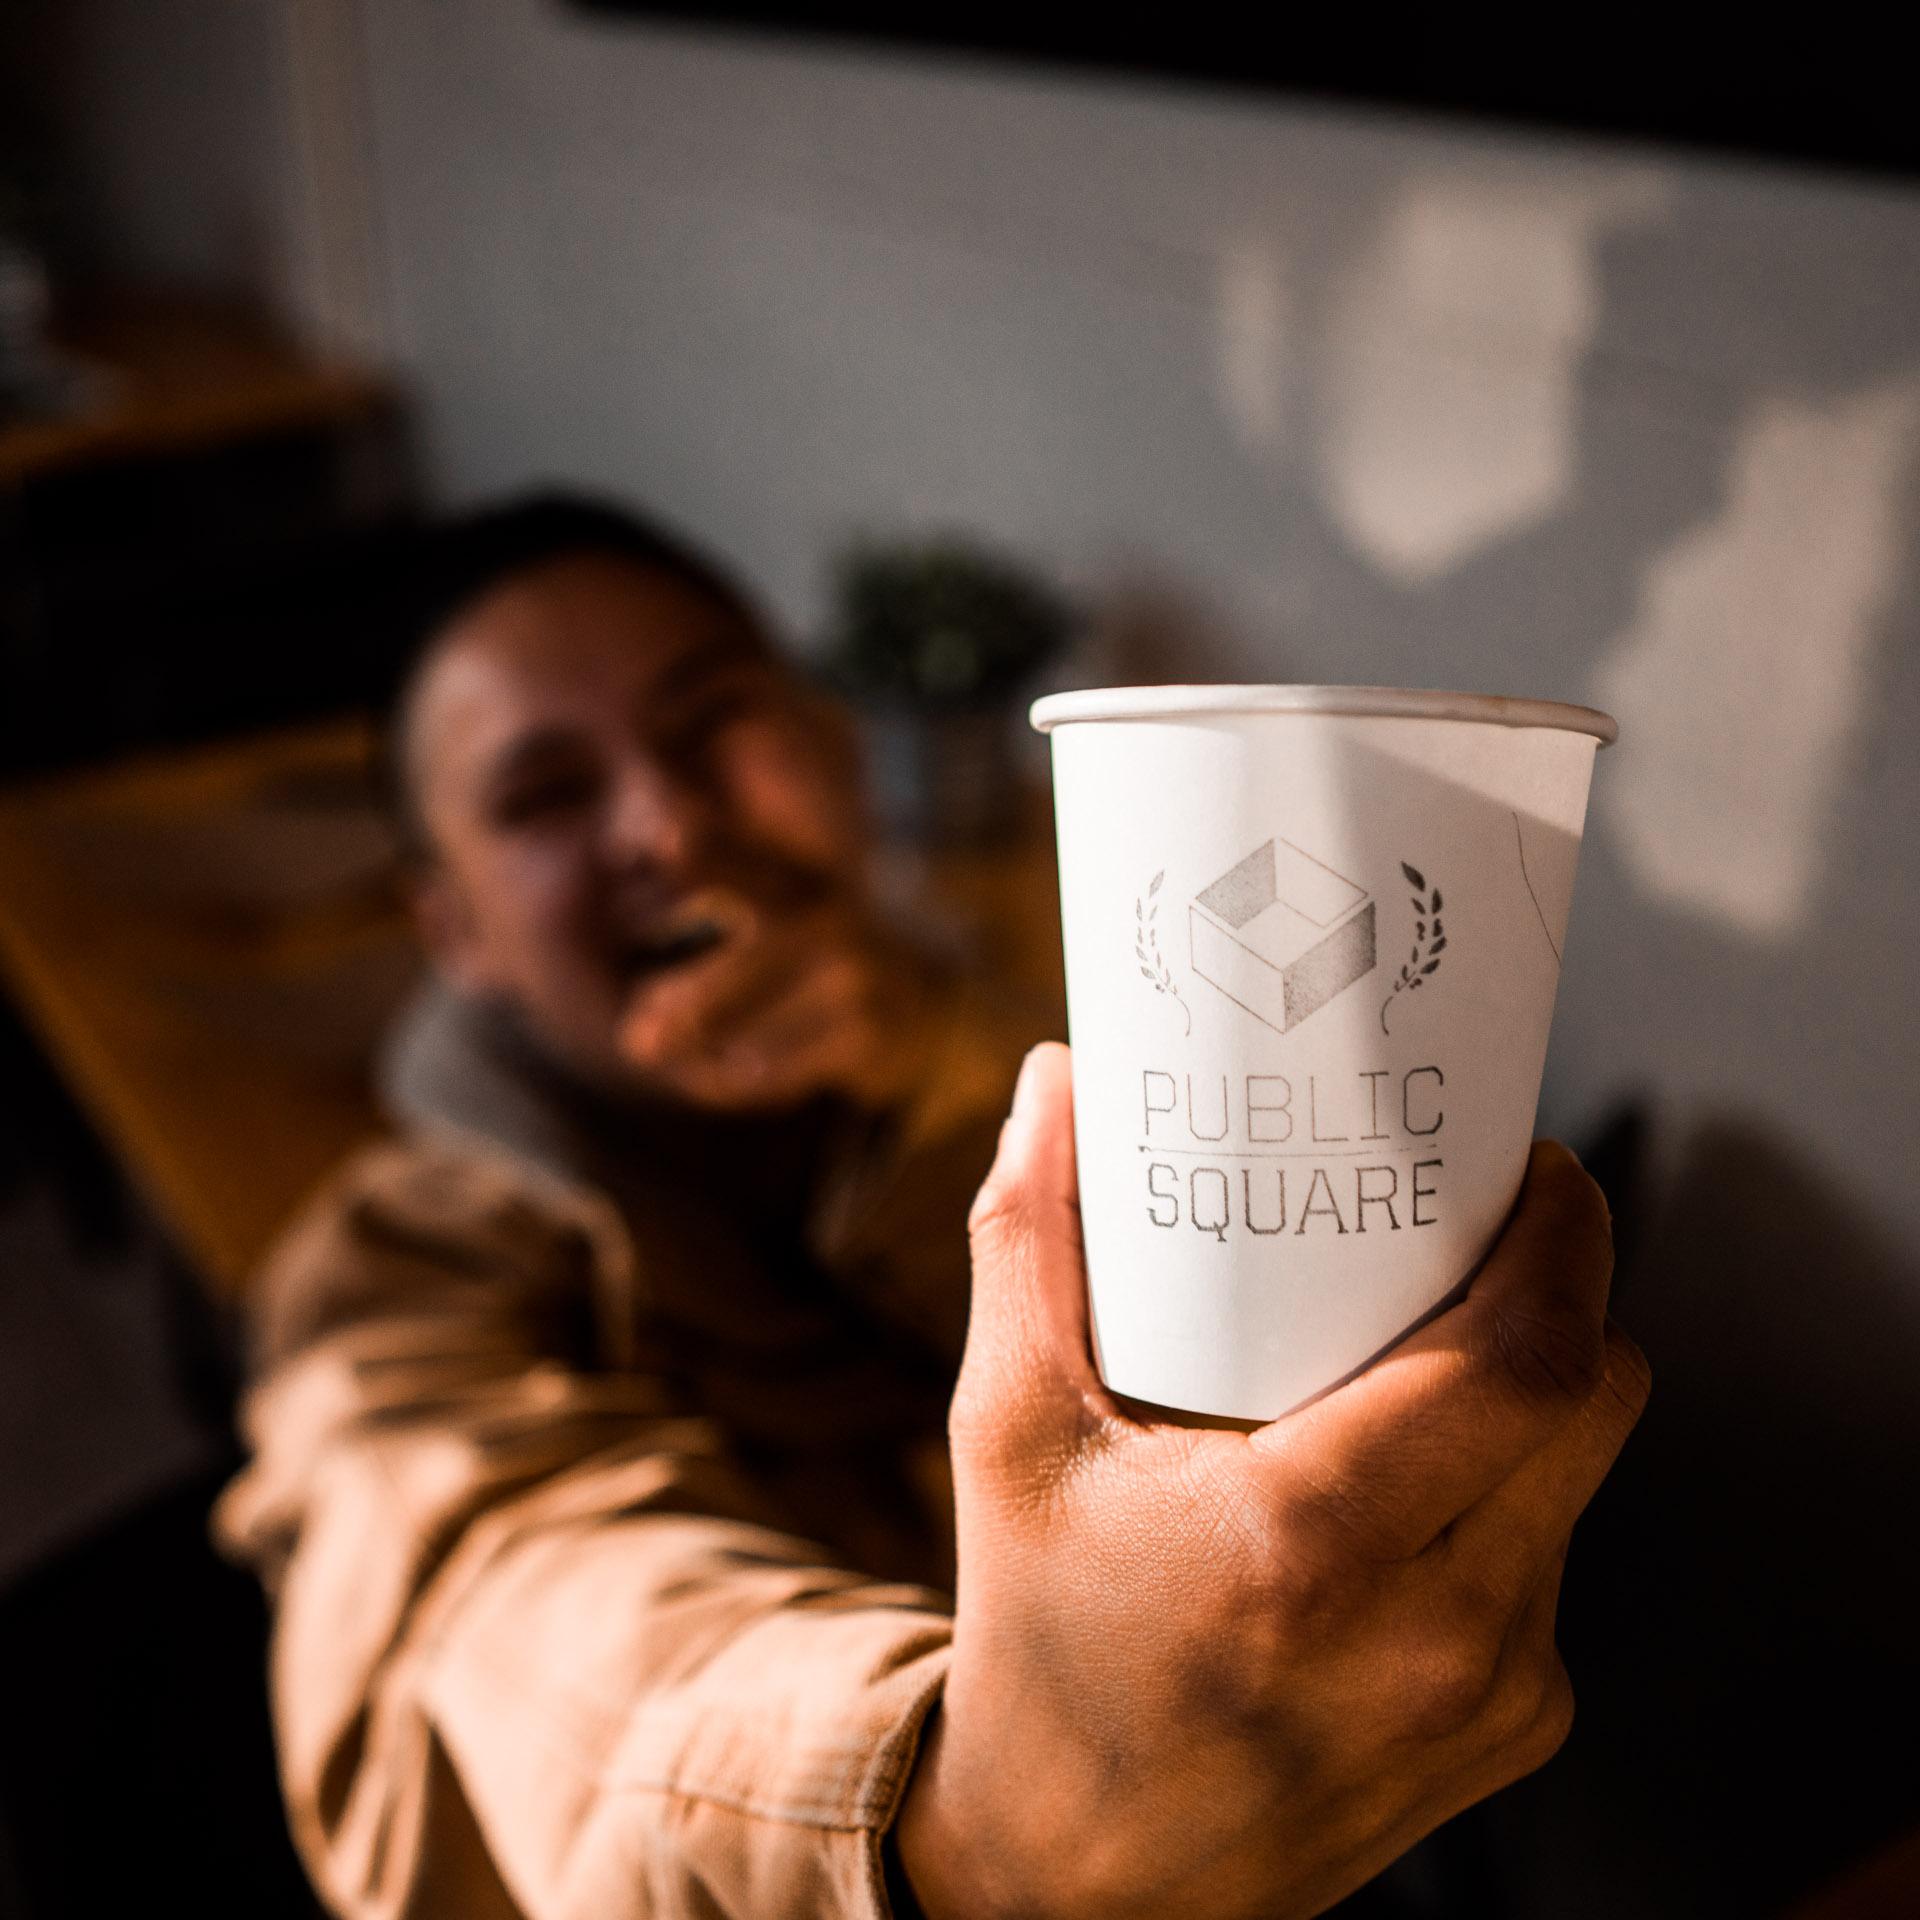 public square cup.jpg